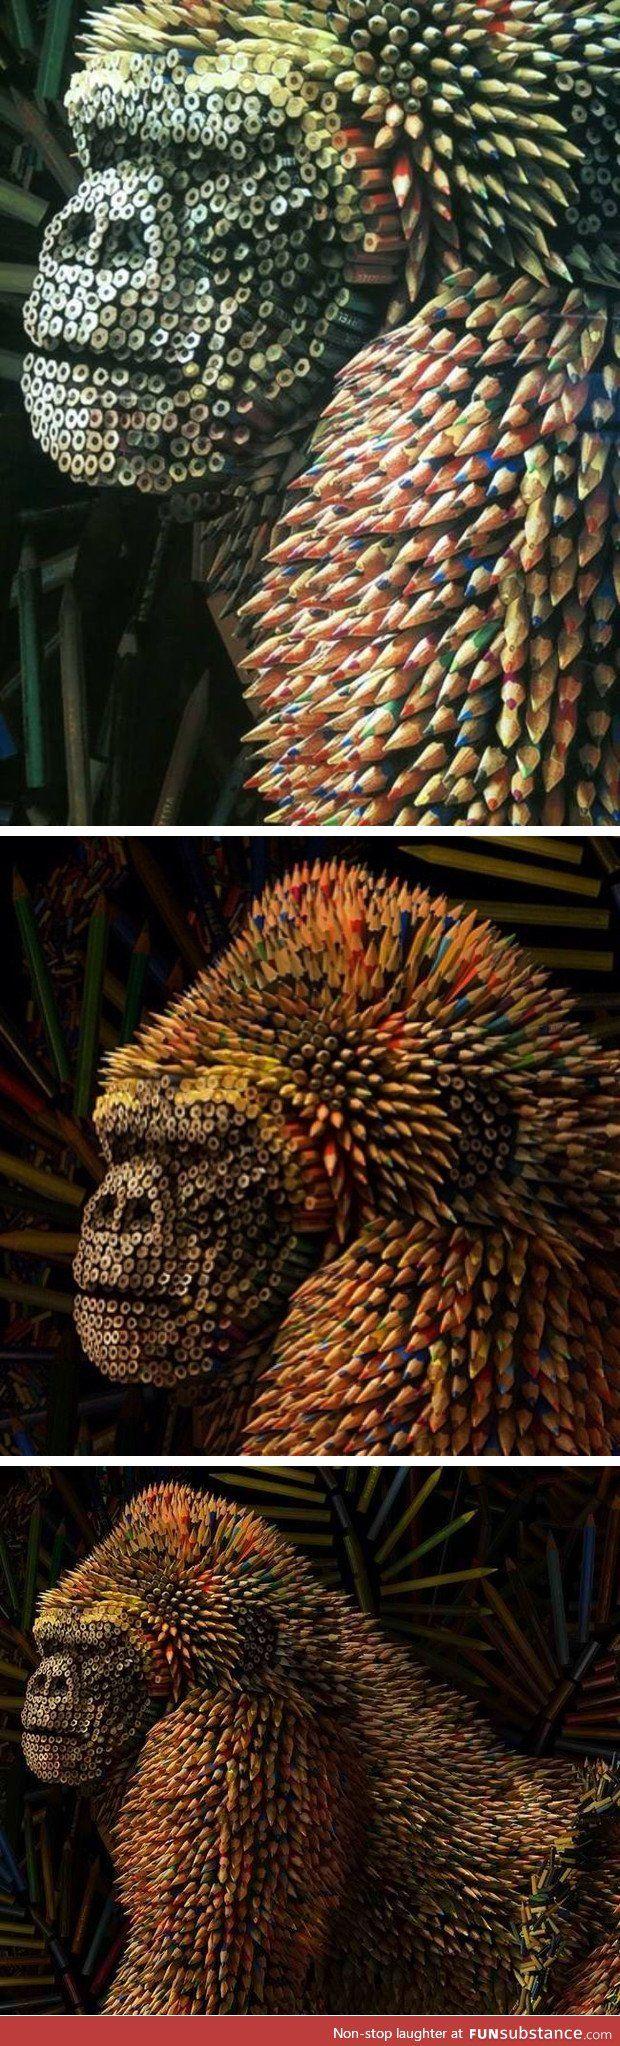 Gorilla made of colored pencils WOAAWOOOAOWOWOWOWAO